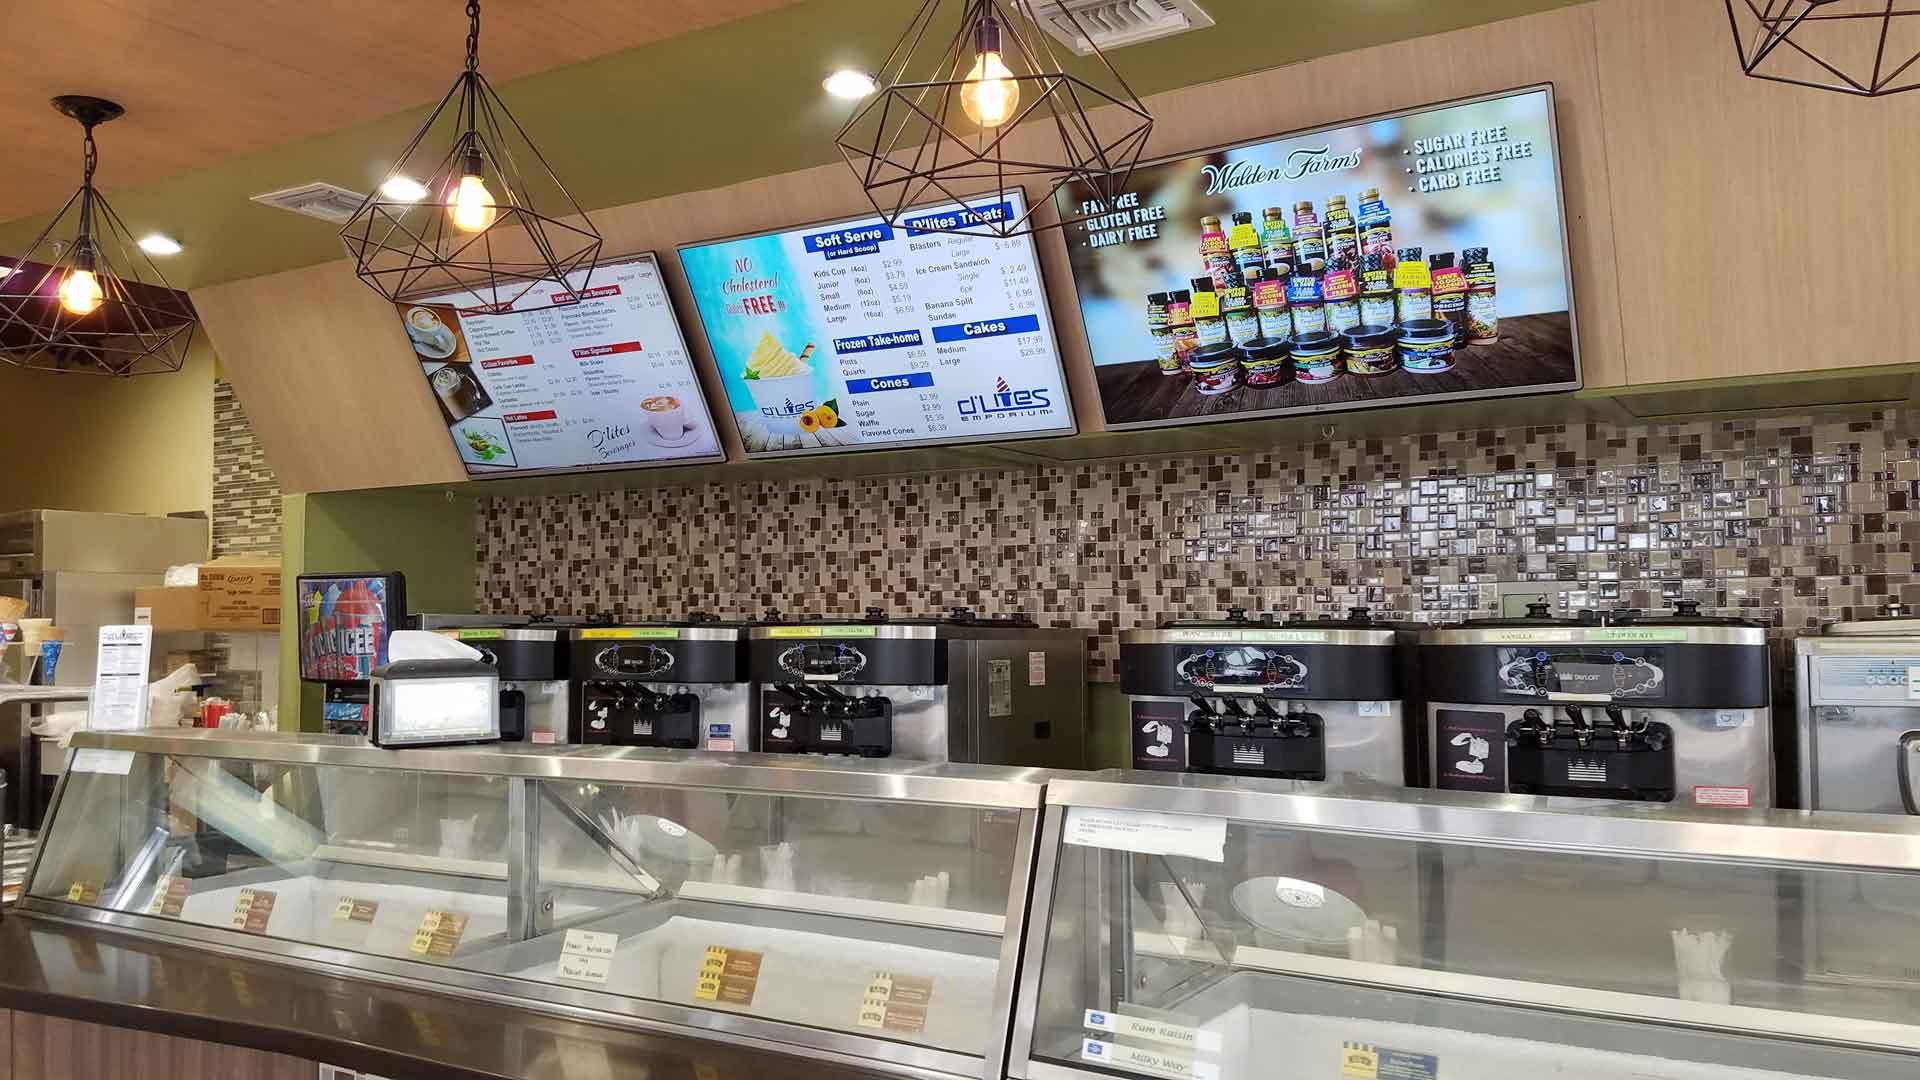 D'lites Ice Cream Digital Menu Boards